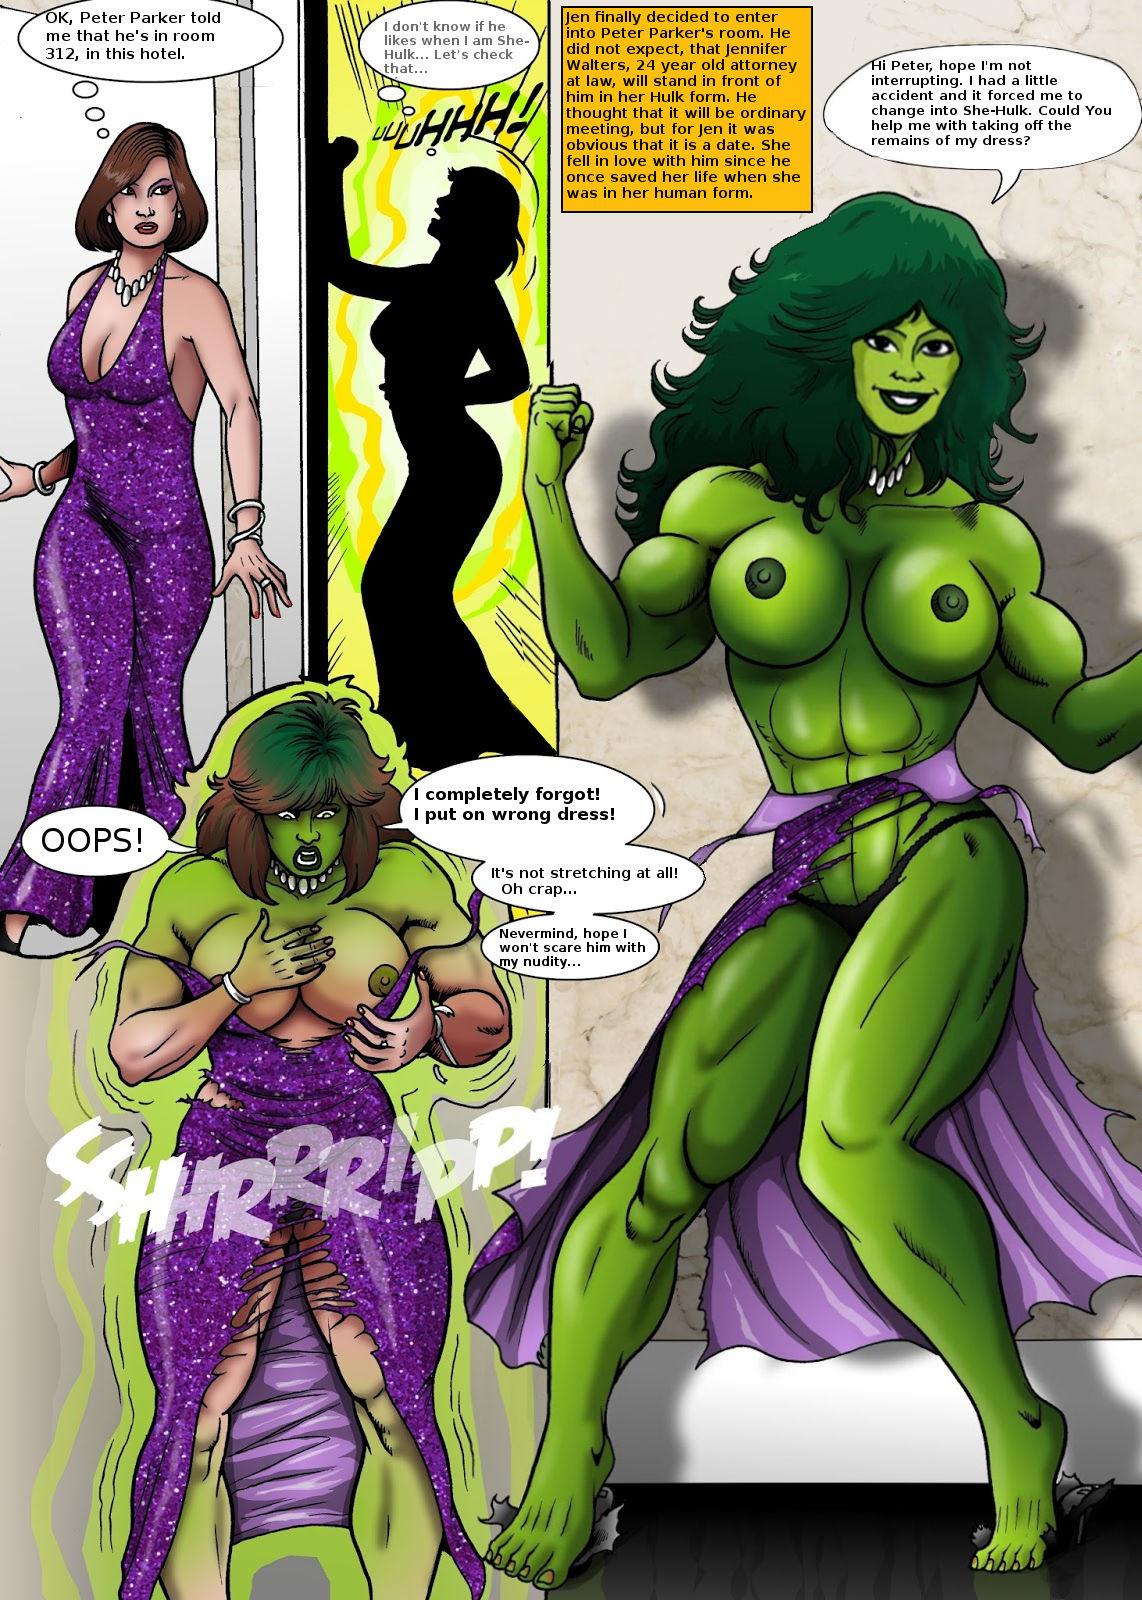 She-Hulk Transformations Hentai Online porn manga and ...